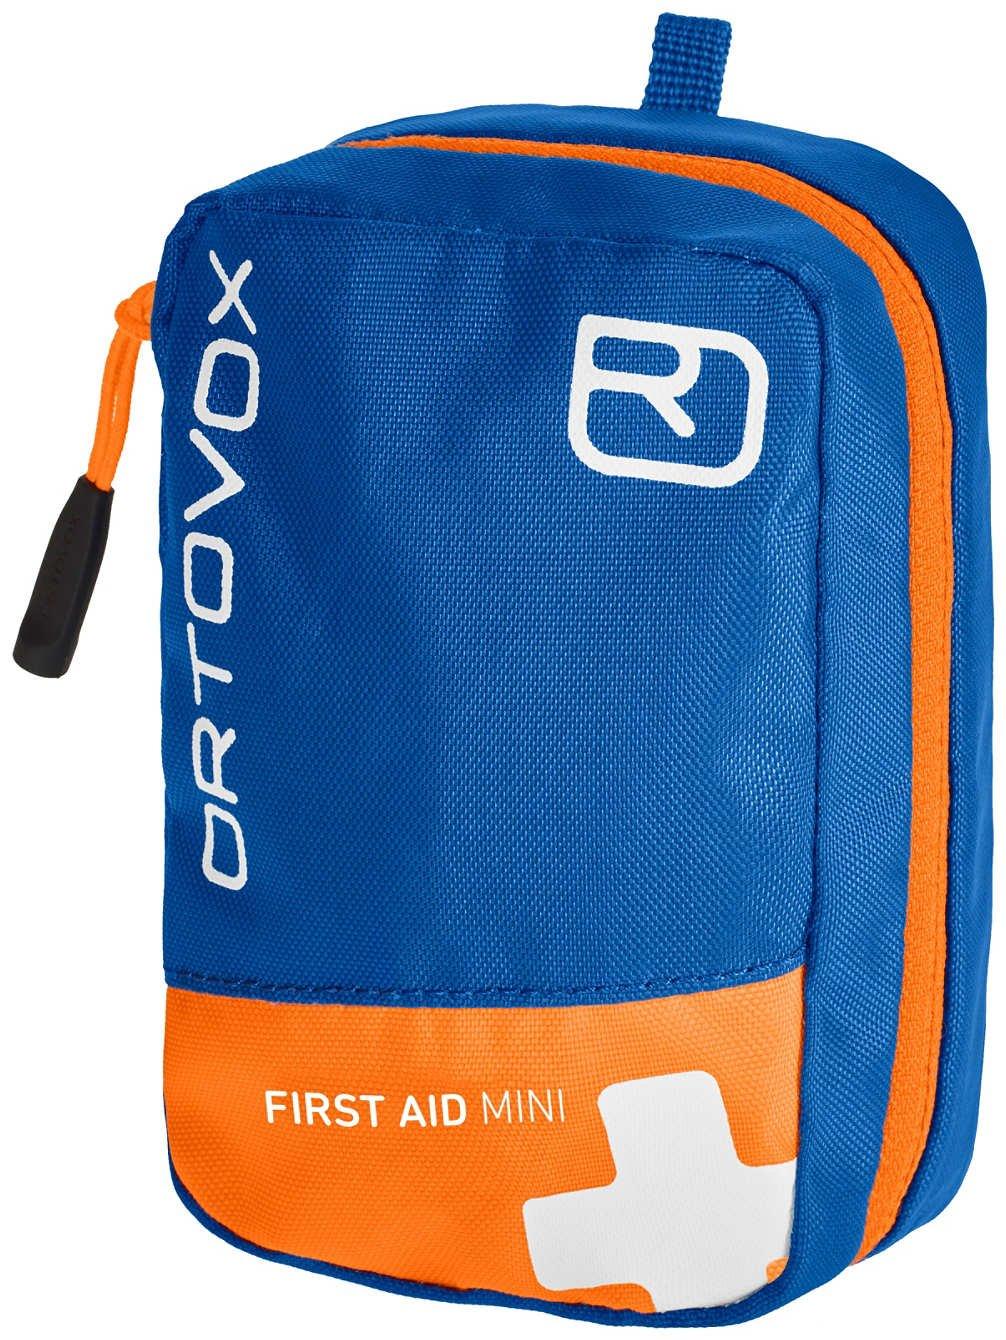 Ortovox 2304000005 Kit de Primeros Auxilios, Unisex Adulto, Azul (Safety Blue), Talla Ú nica Talla Única